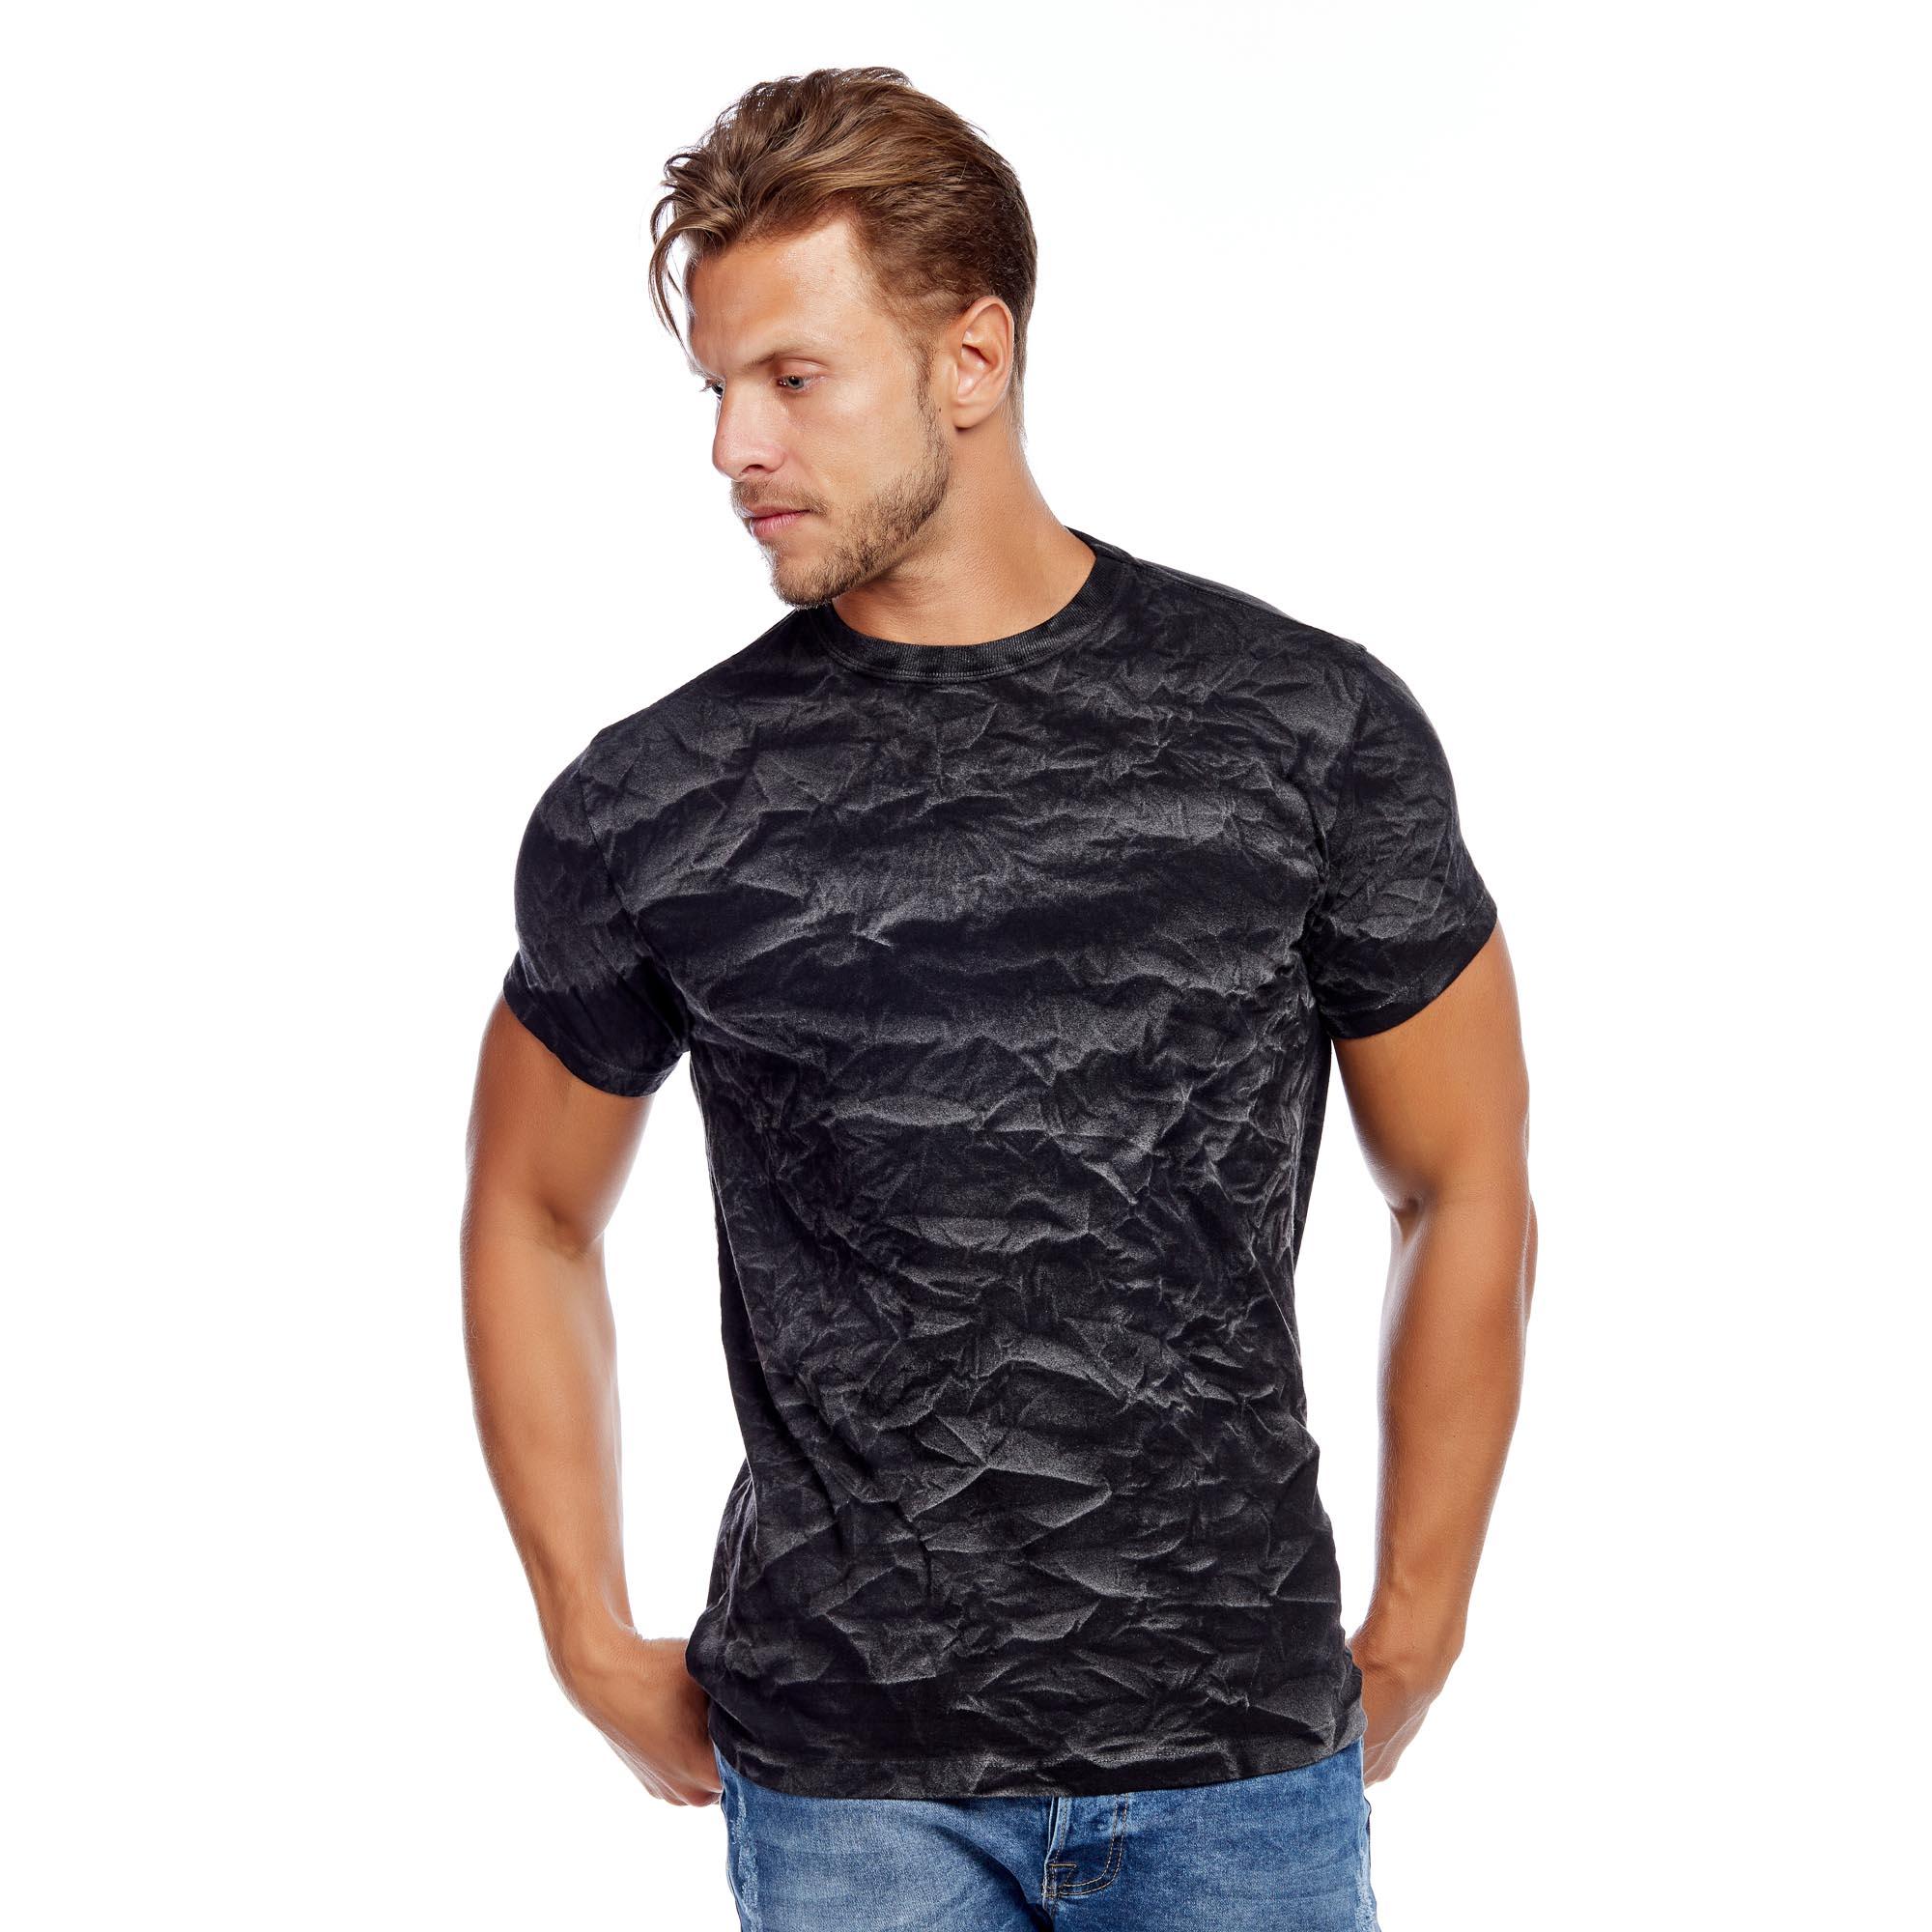 Camiseta Masculina 3D Evolvee